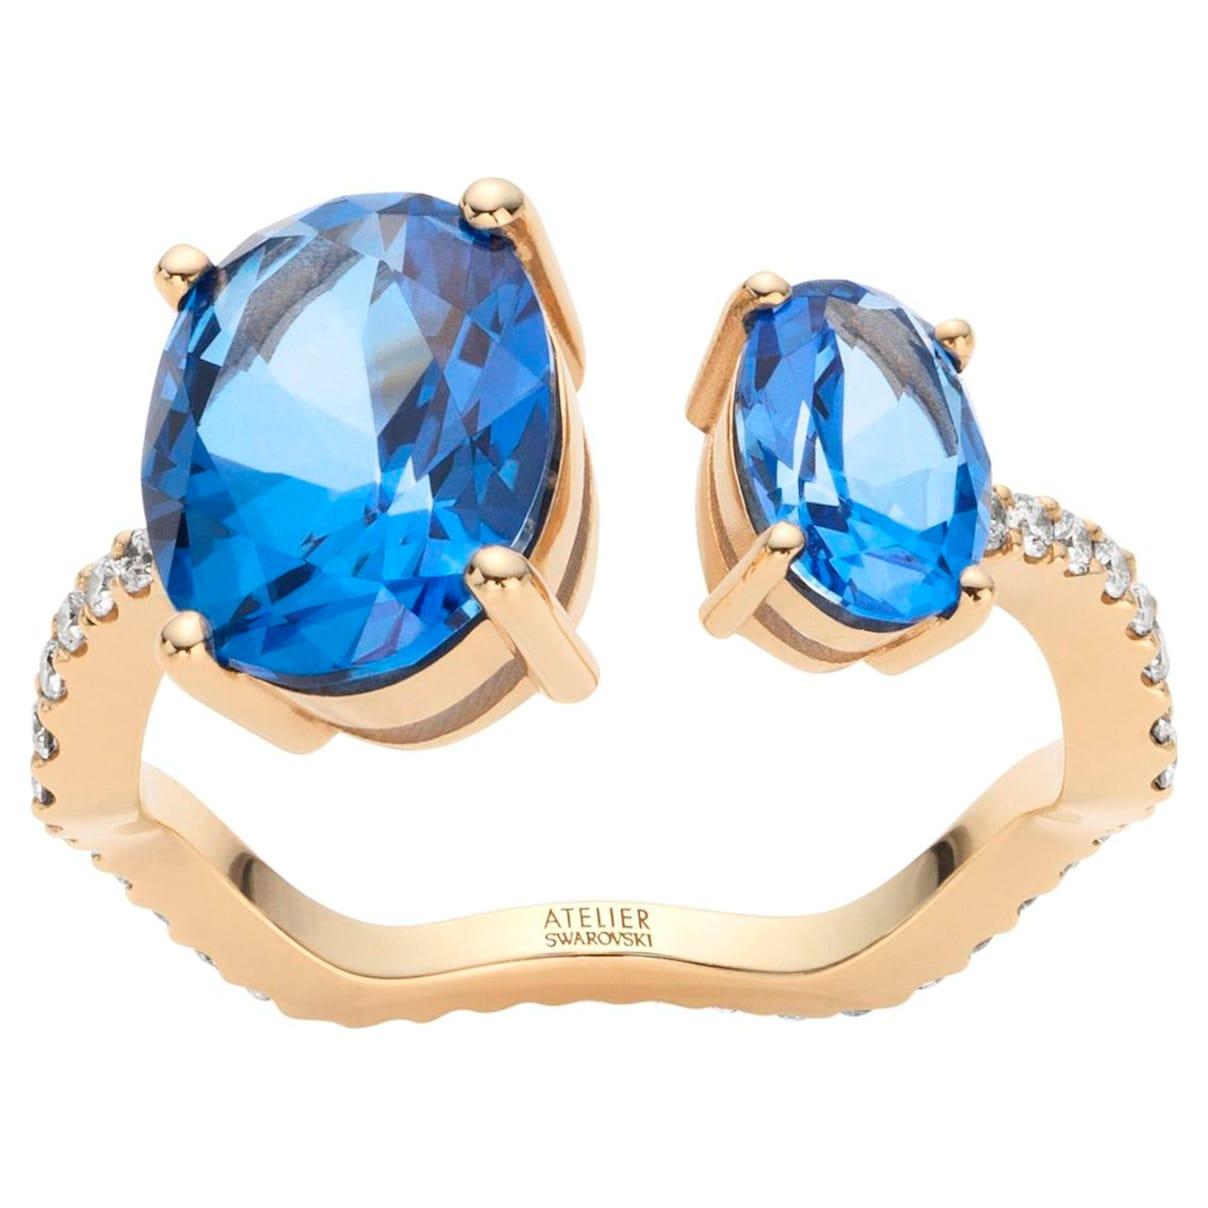 Arc-en-ciel Ring, Caribbean Blue, 18K Yellow Gold, Size 48